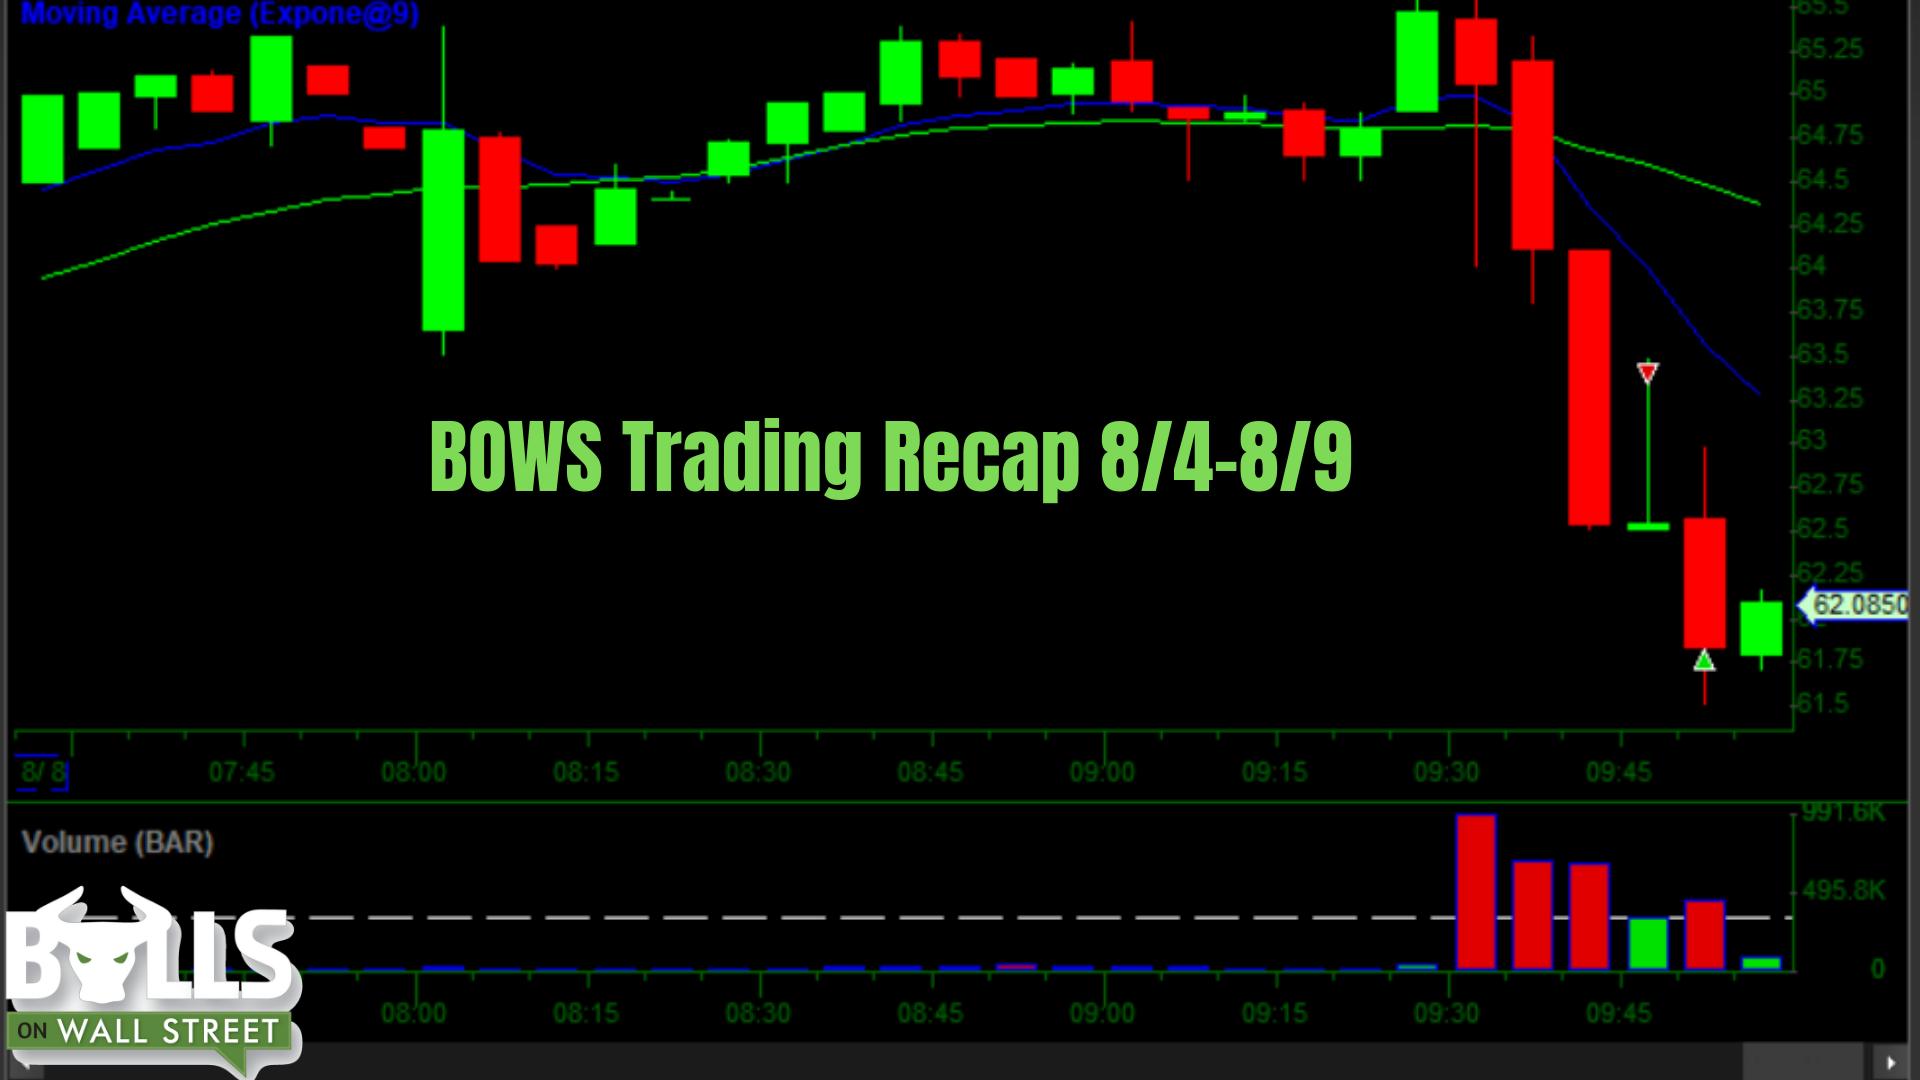 trading recap